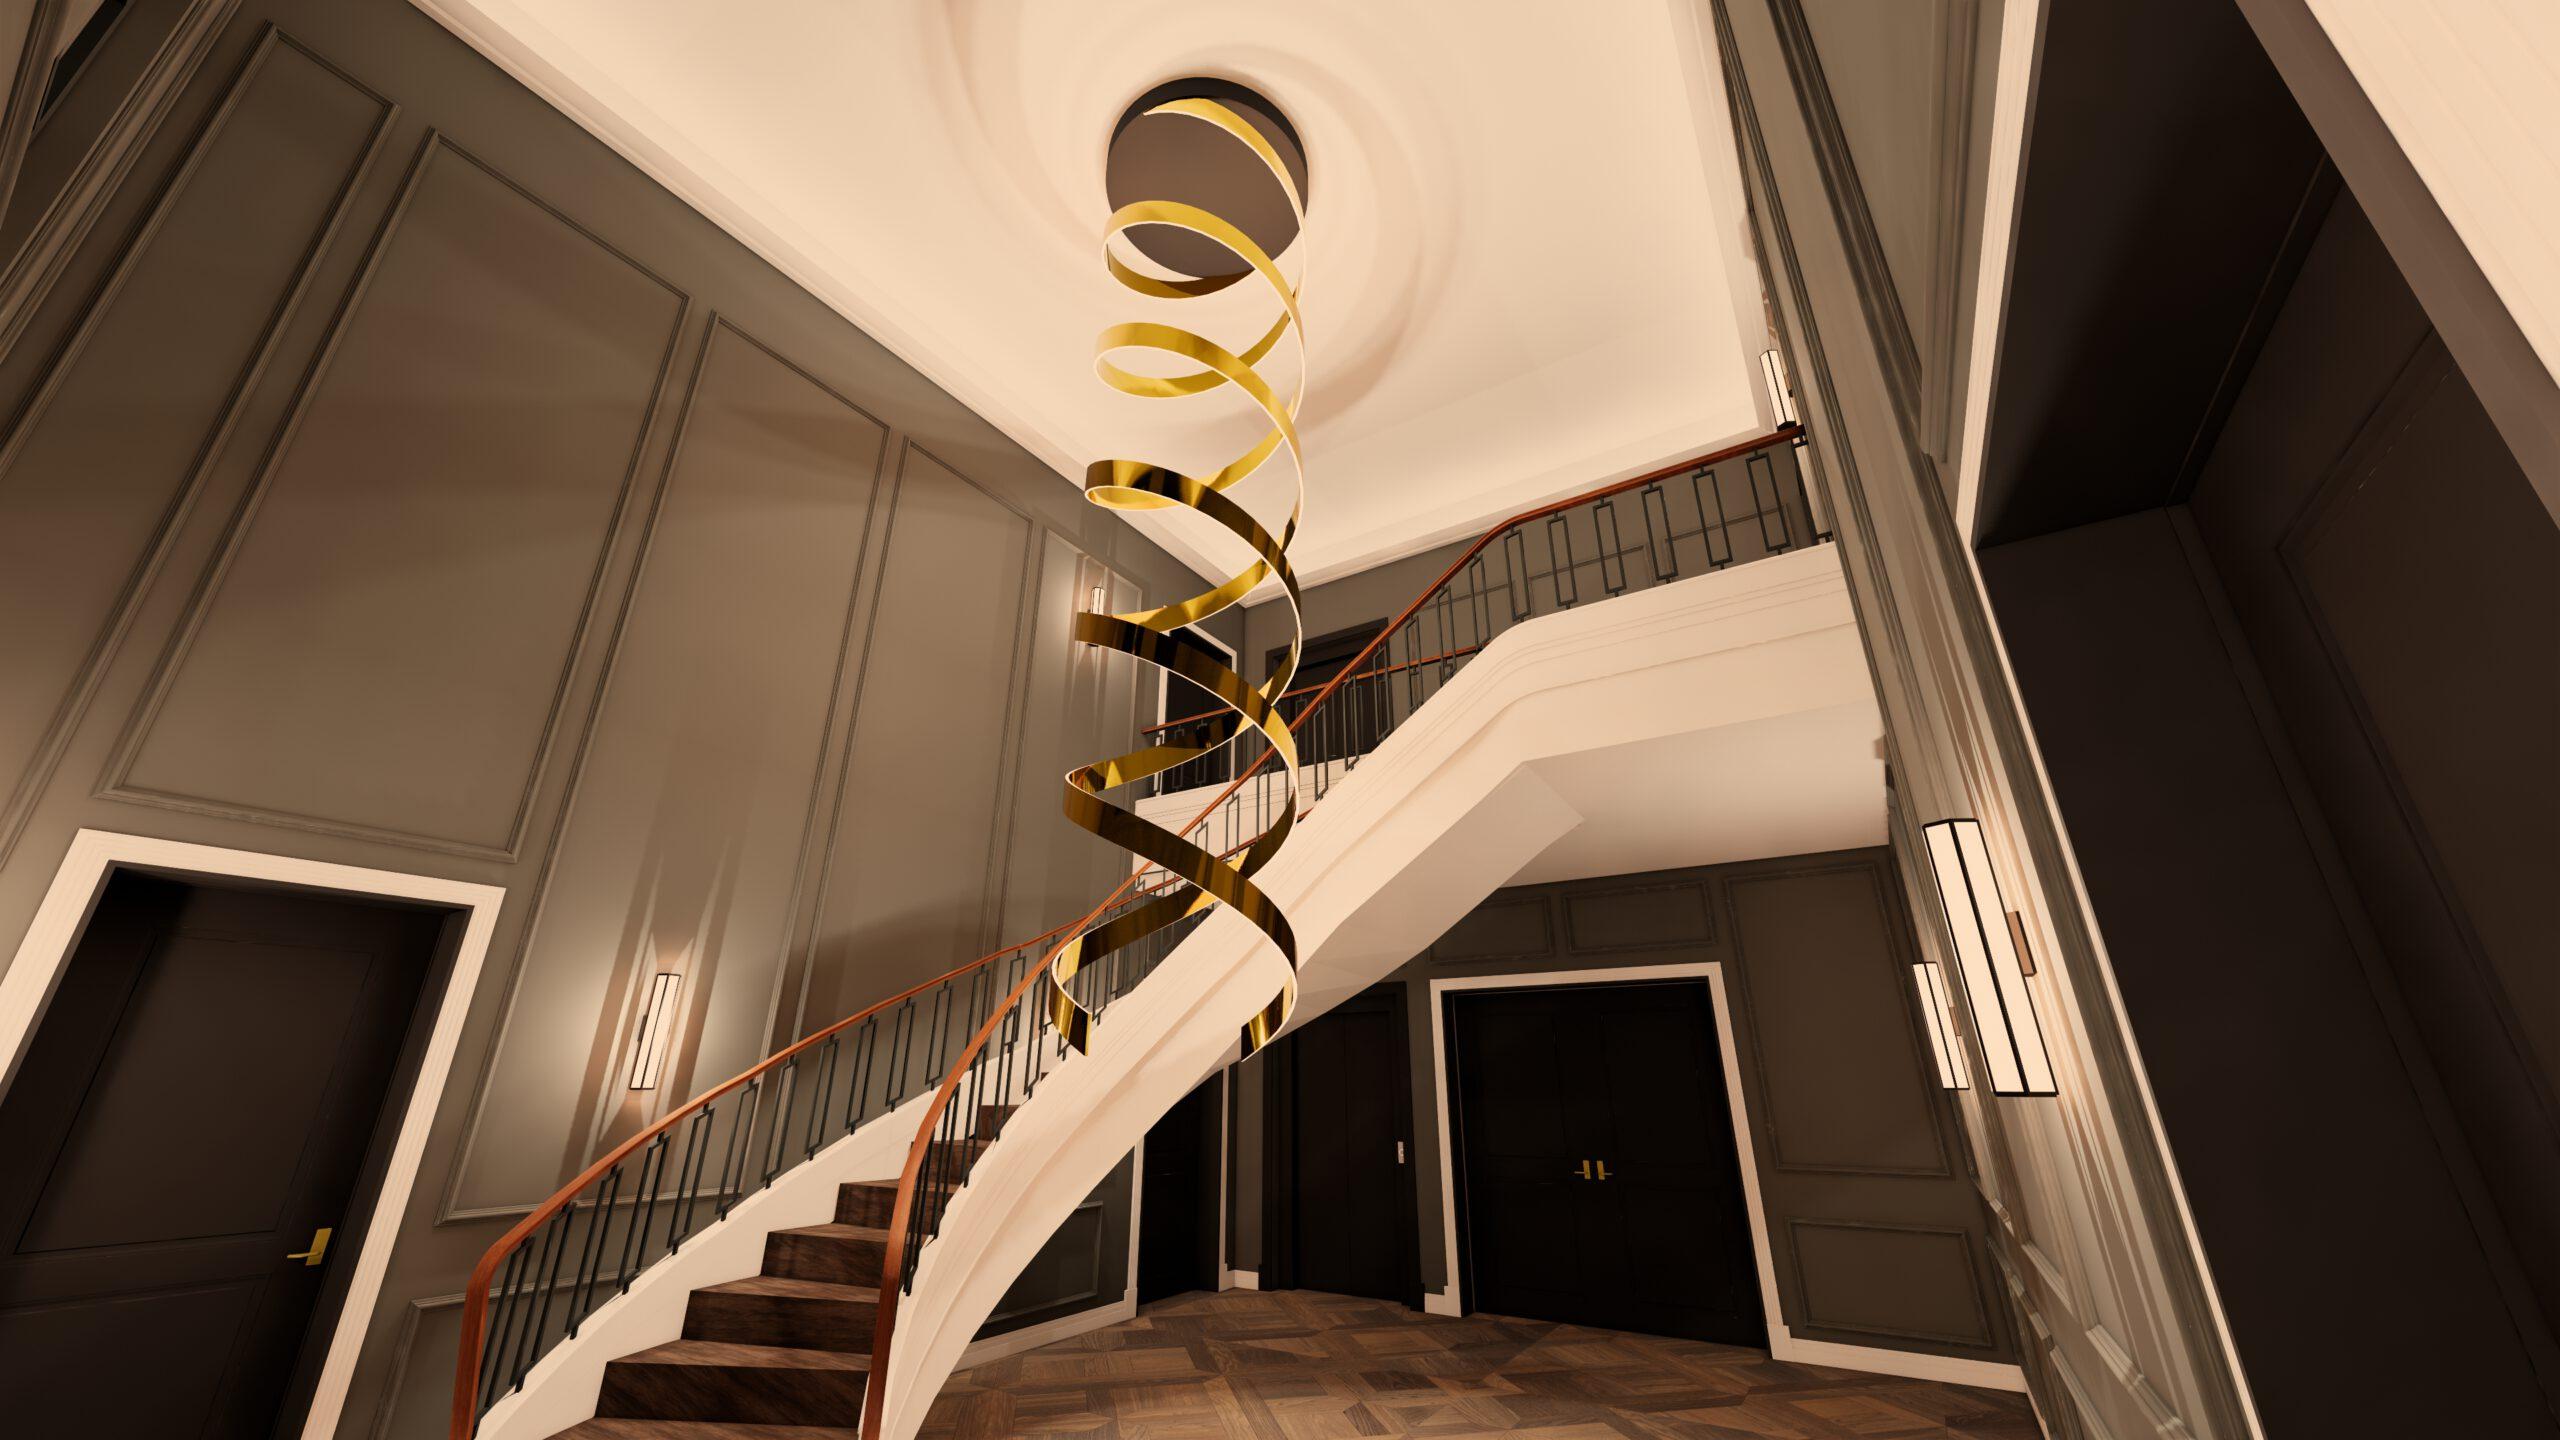 Villa Design Kronleuchter Treppe Halle Foyer Wandpanel Wandabwicklung Parkettboden Holz Gold Leuchte LED